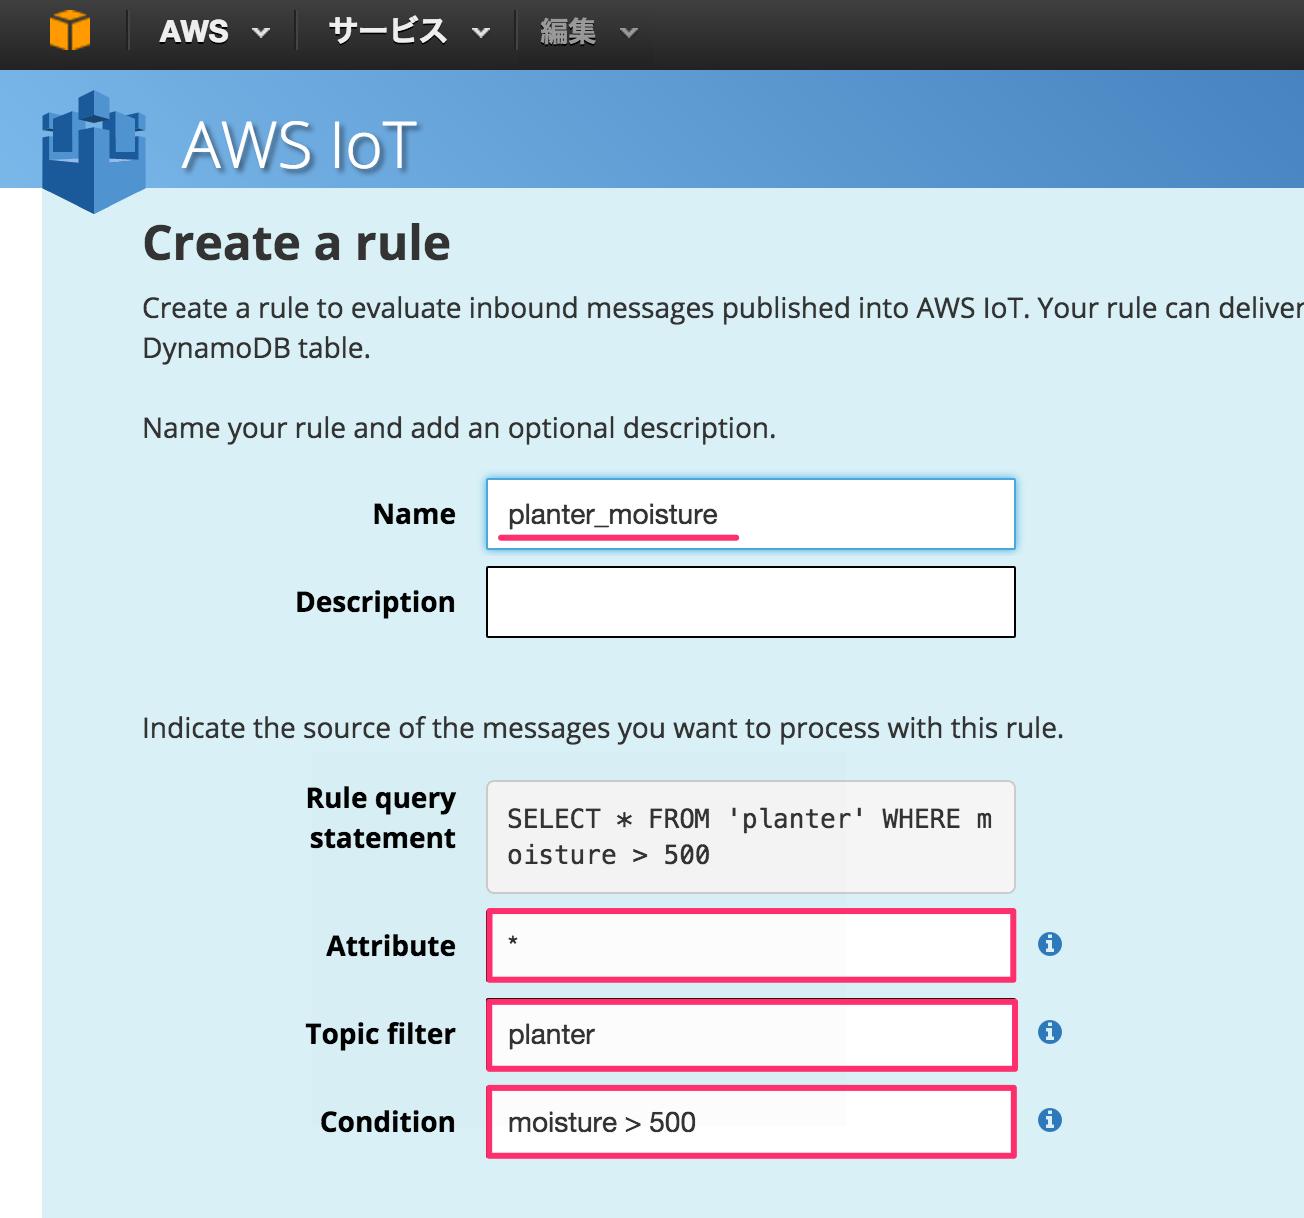 Window_と_AWS_IoT 4.png